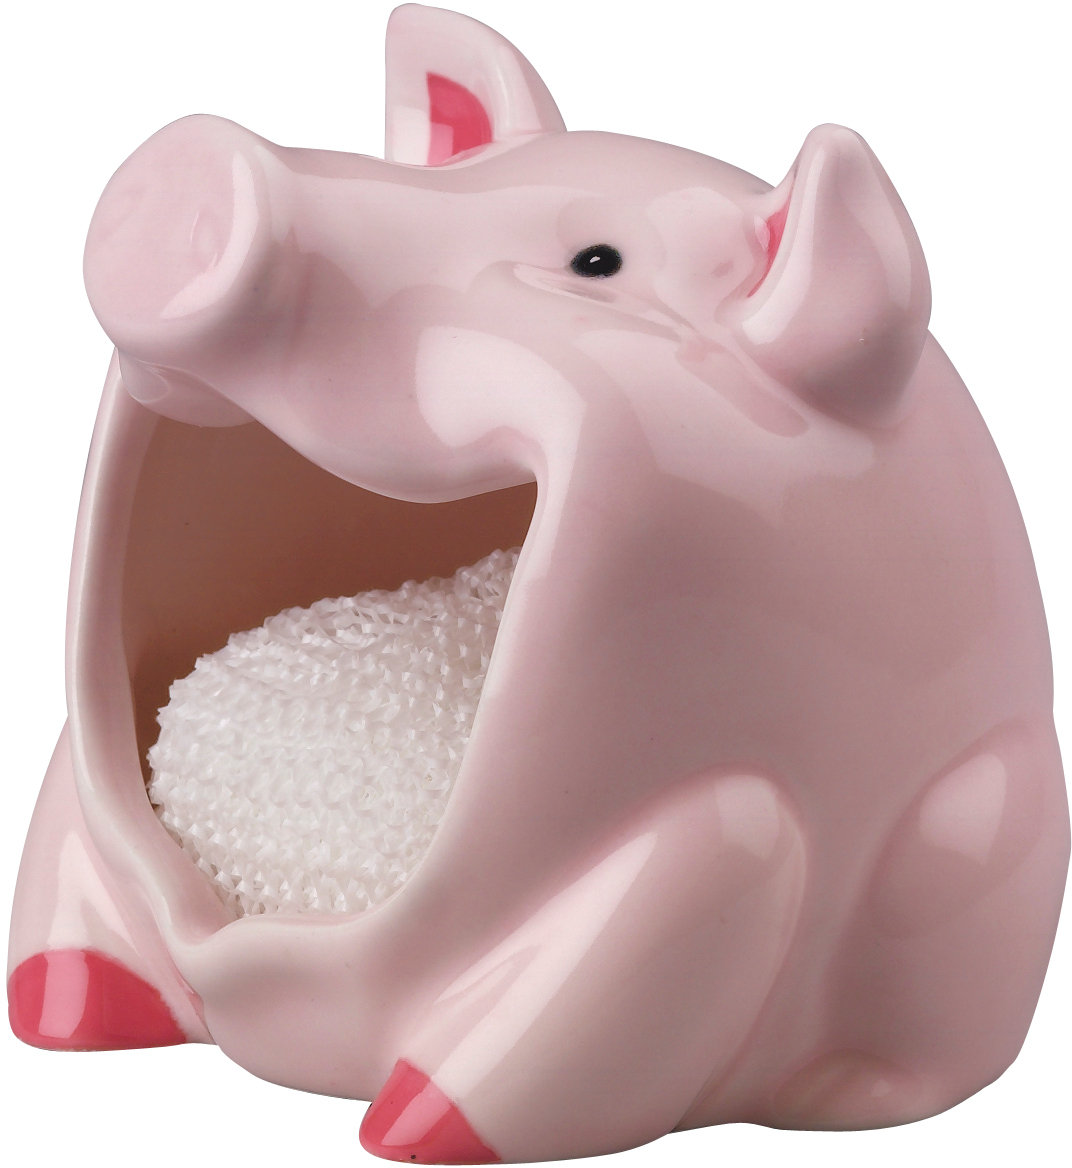 Boston Warehouse Pink Earthenware Pig Scrubby Holder